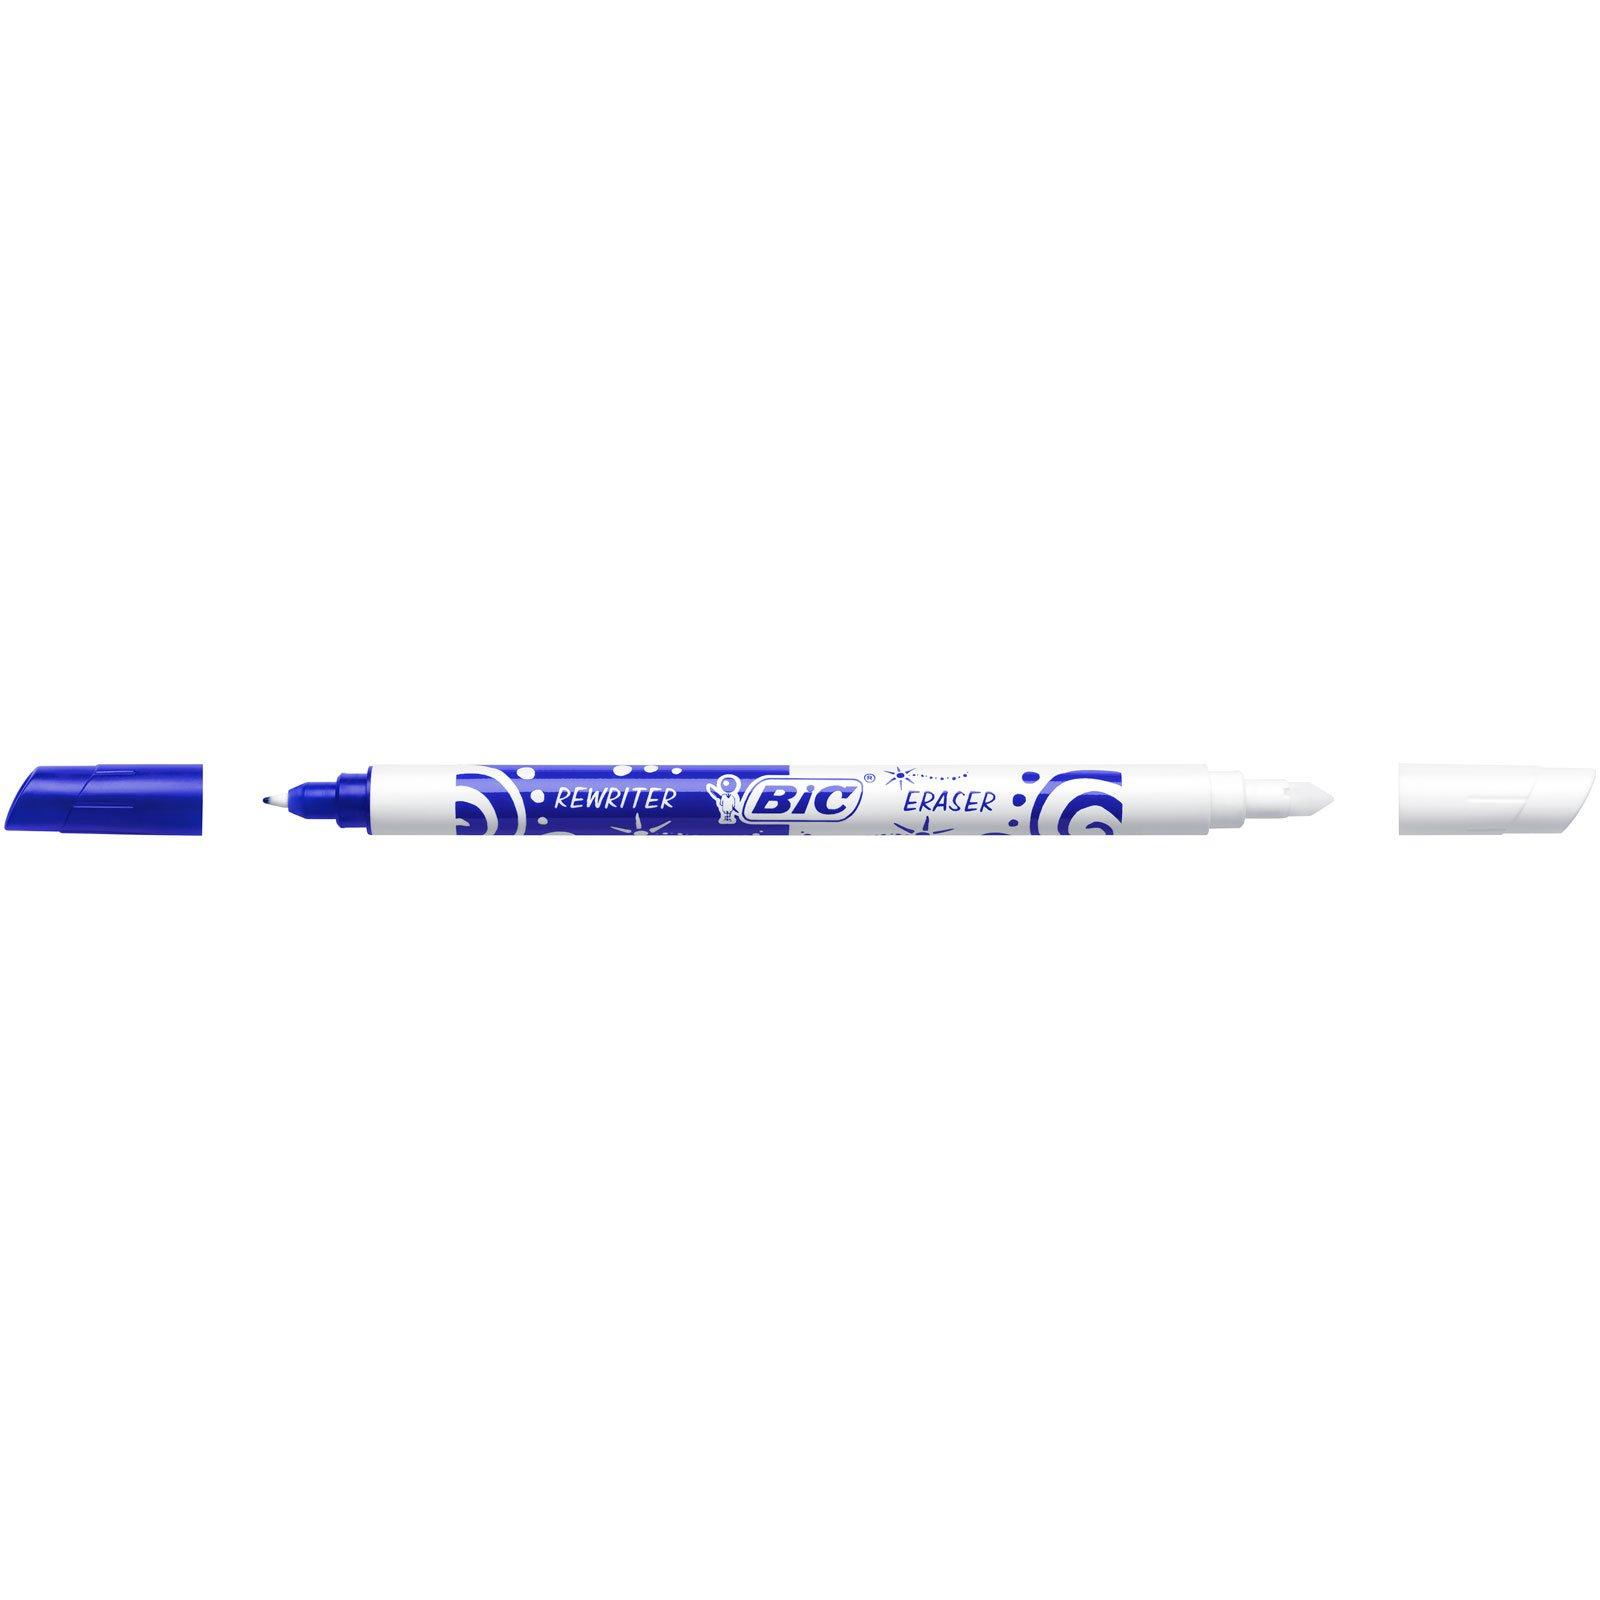 BIC Ink Eater Eraser Pens - Pack of 8+4 by BIC (Image #3)